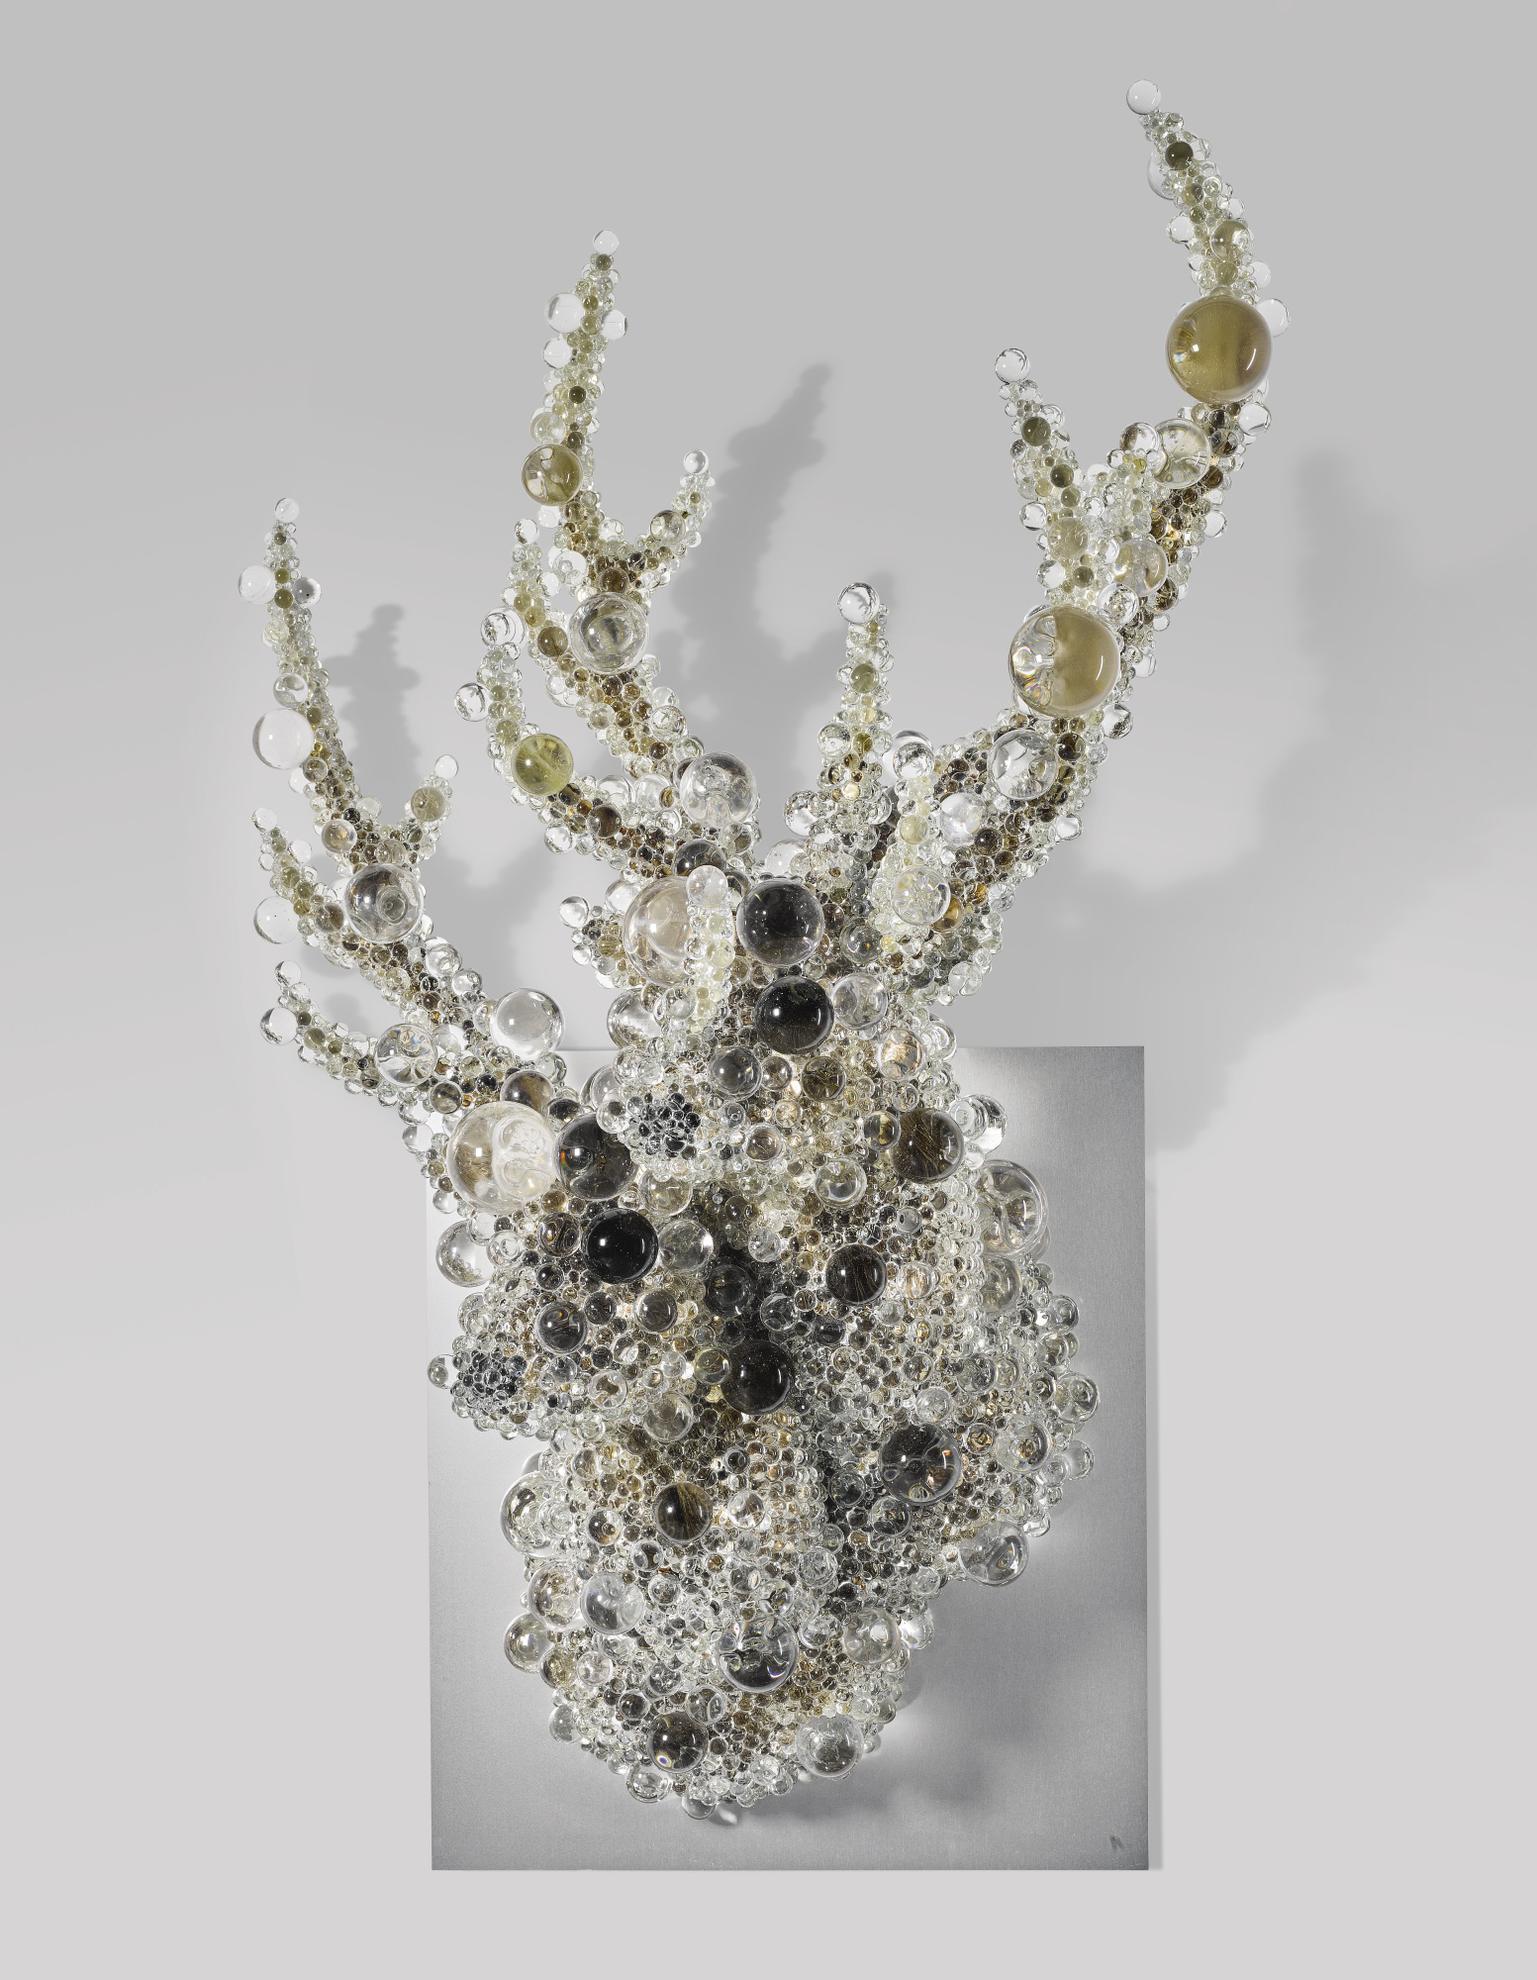 Kohei Nawa-Pixcell-Double Deer 2-2010